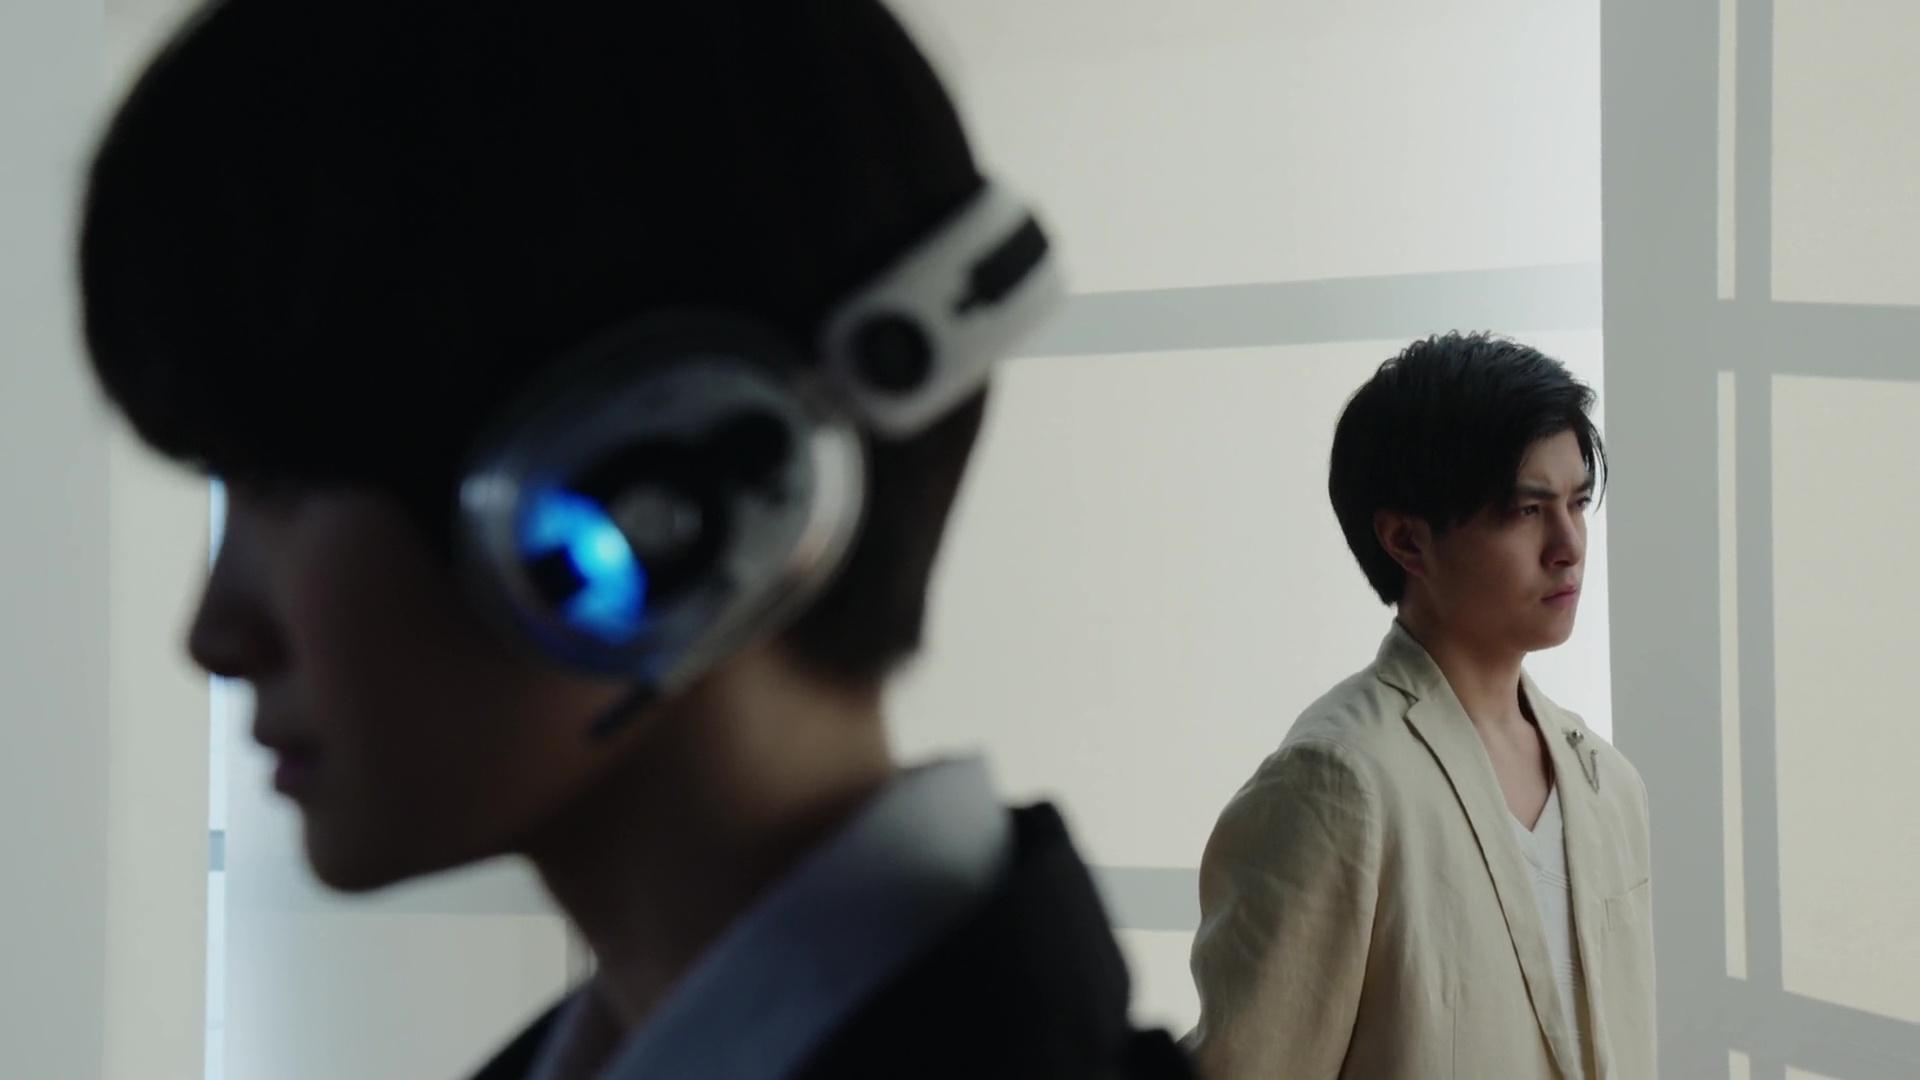 Recap: Kamen Rider Zero-One – Project Thouser (Part 1)